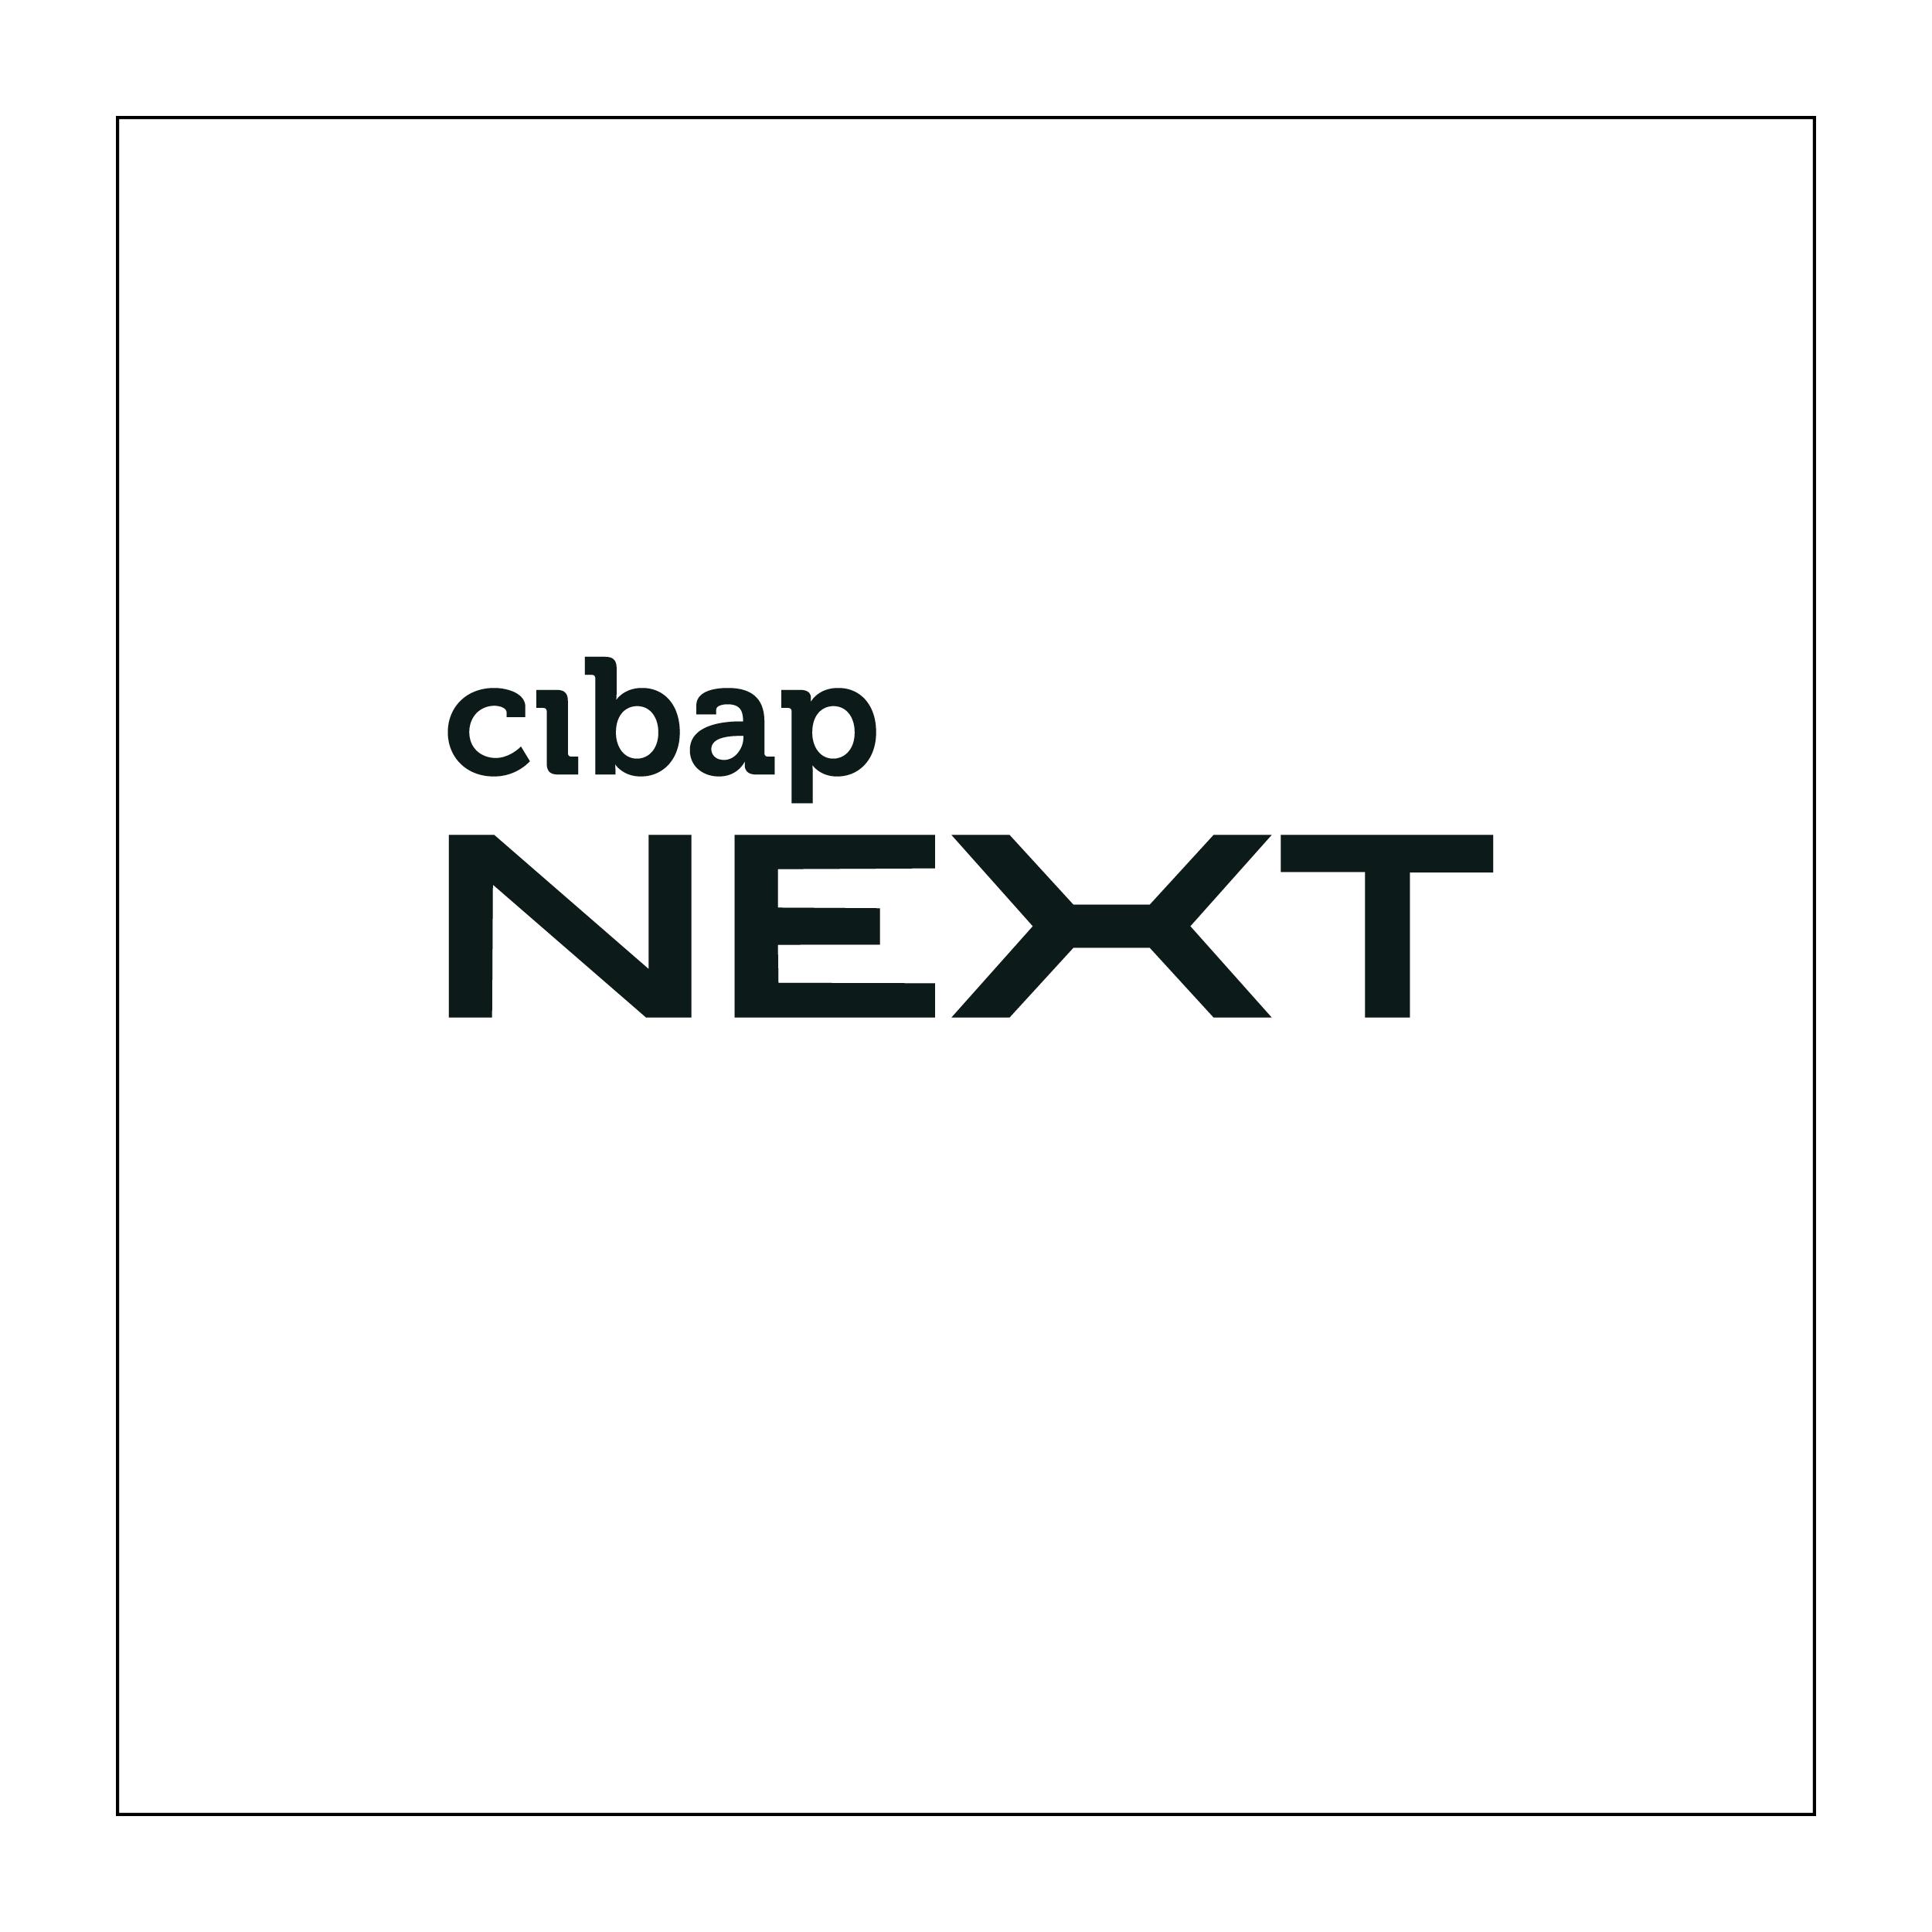 cibap next